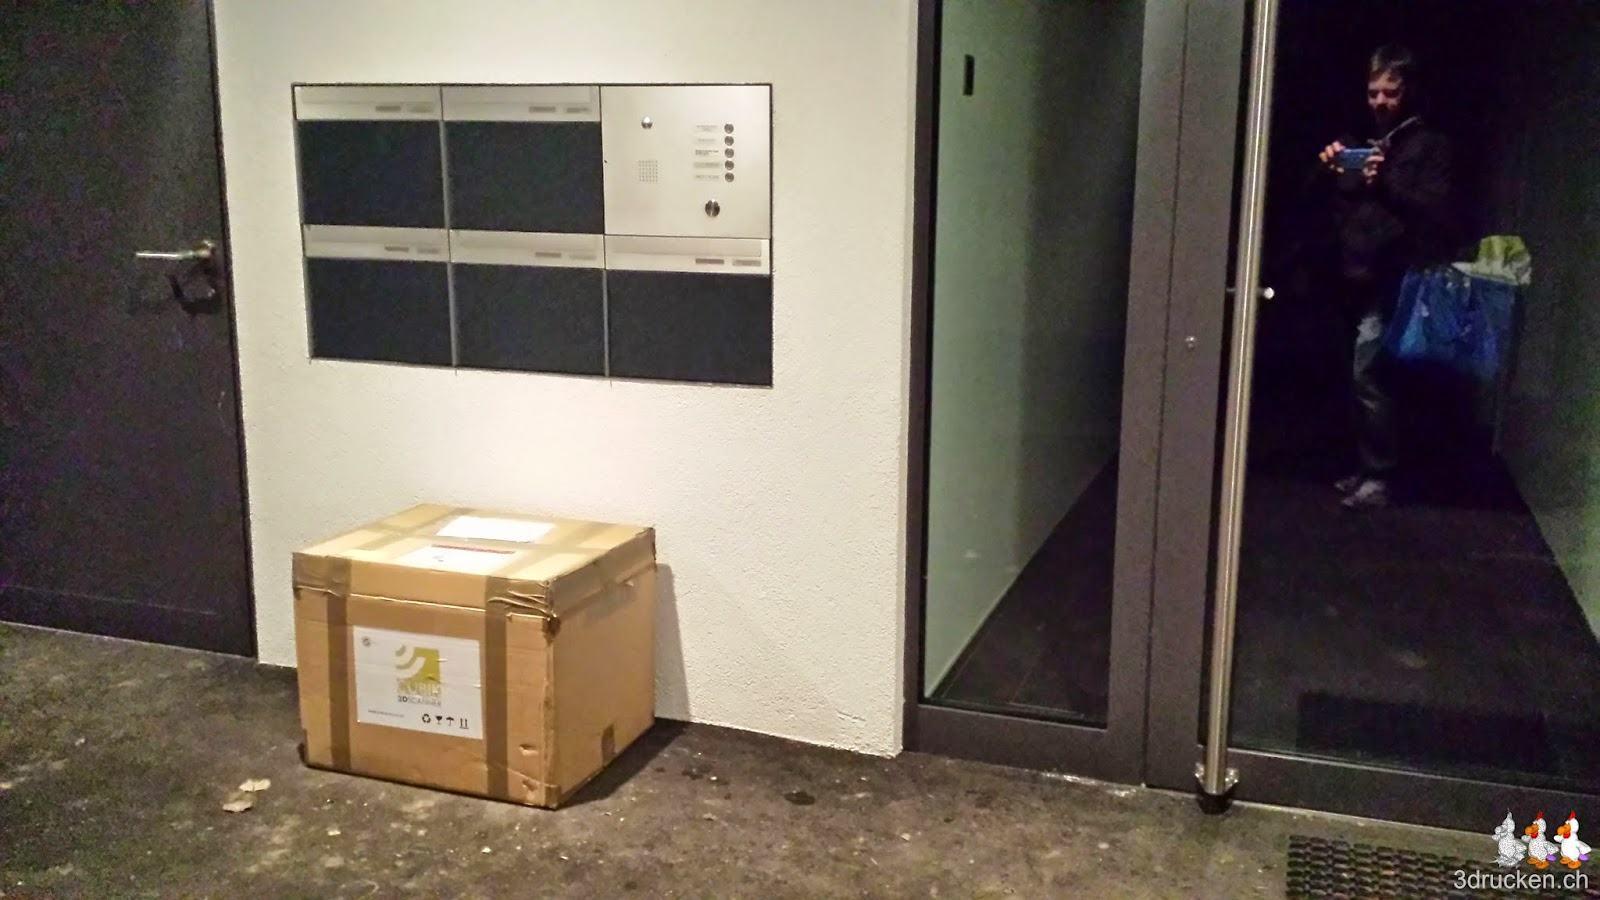 Foto des Pakets mit dem Cubik 3D-Scanner vor unserer Haustür